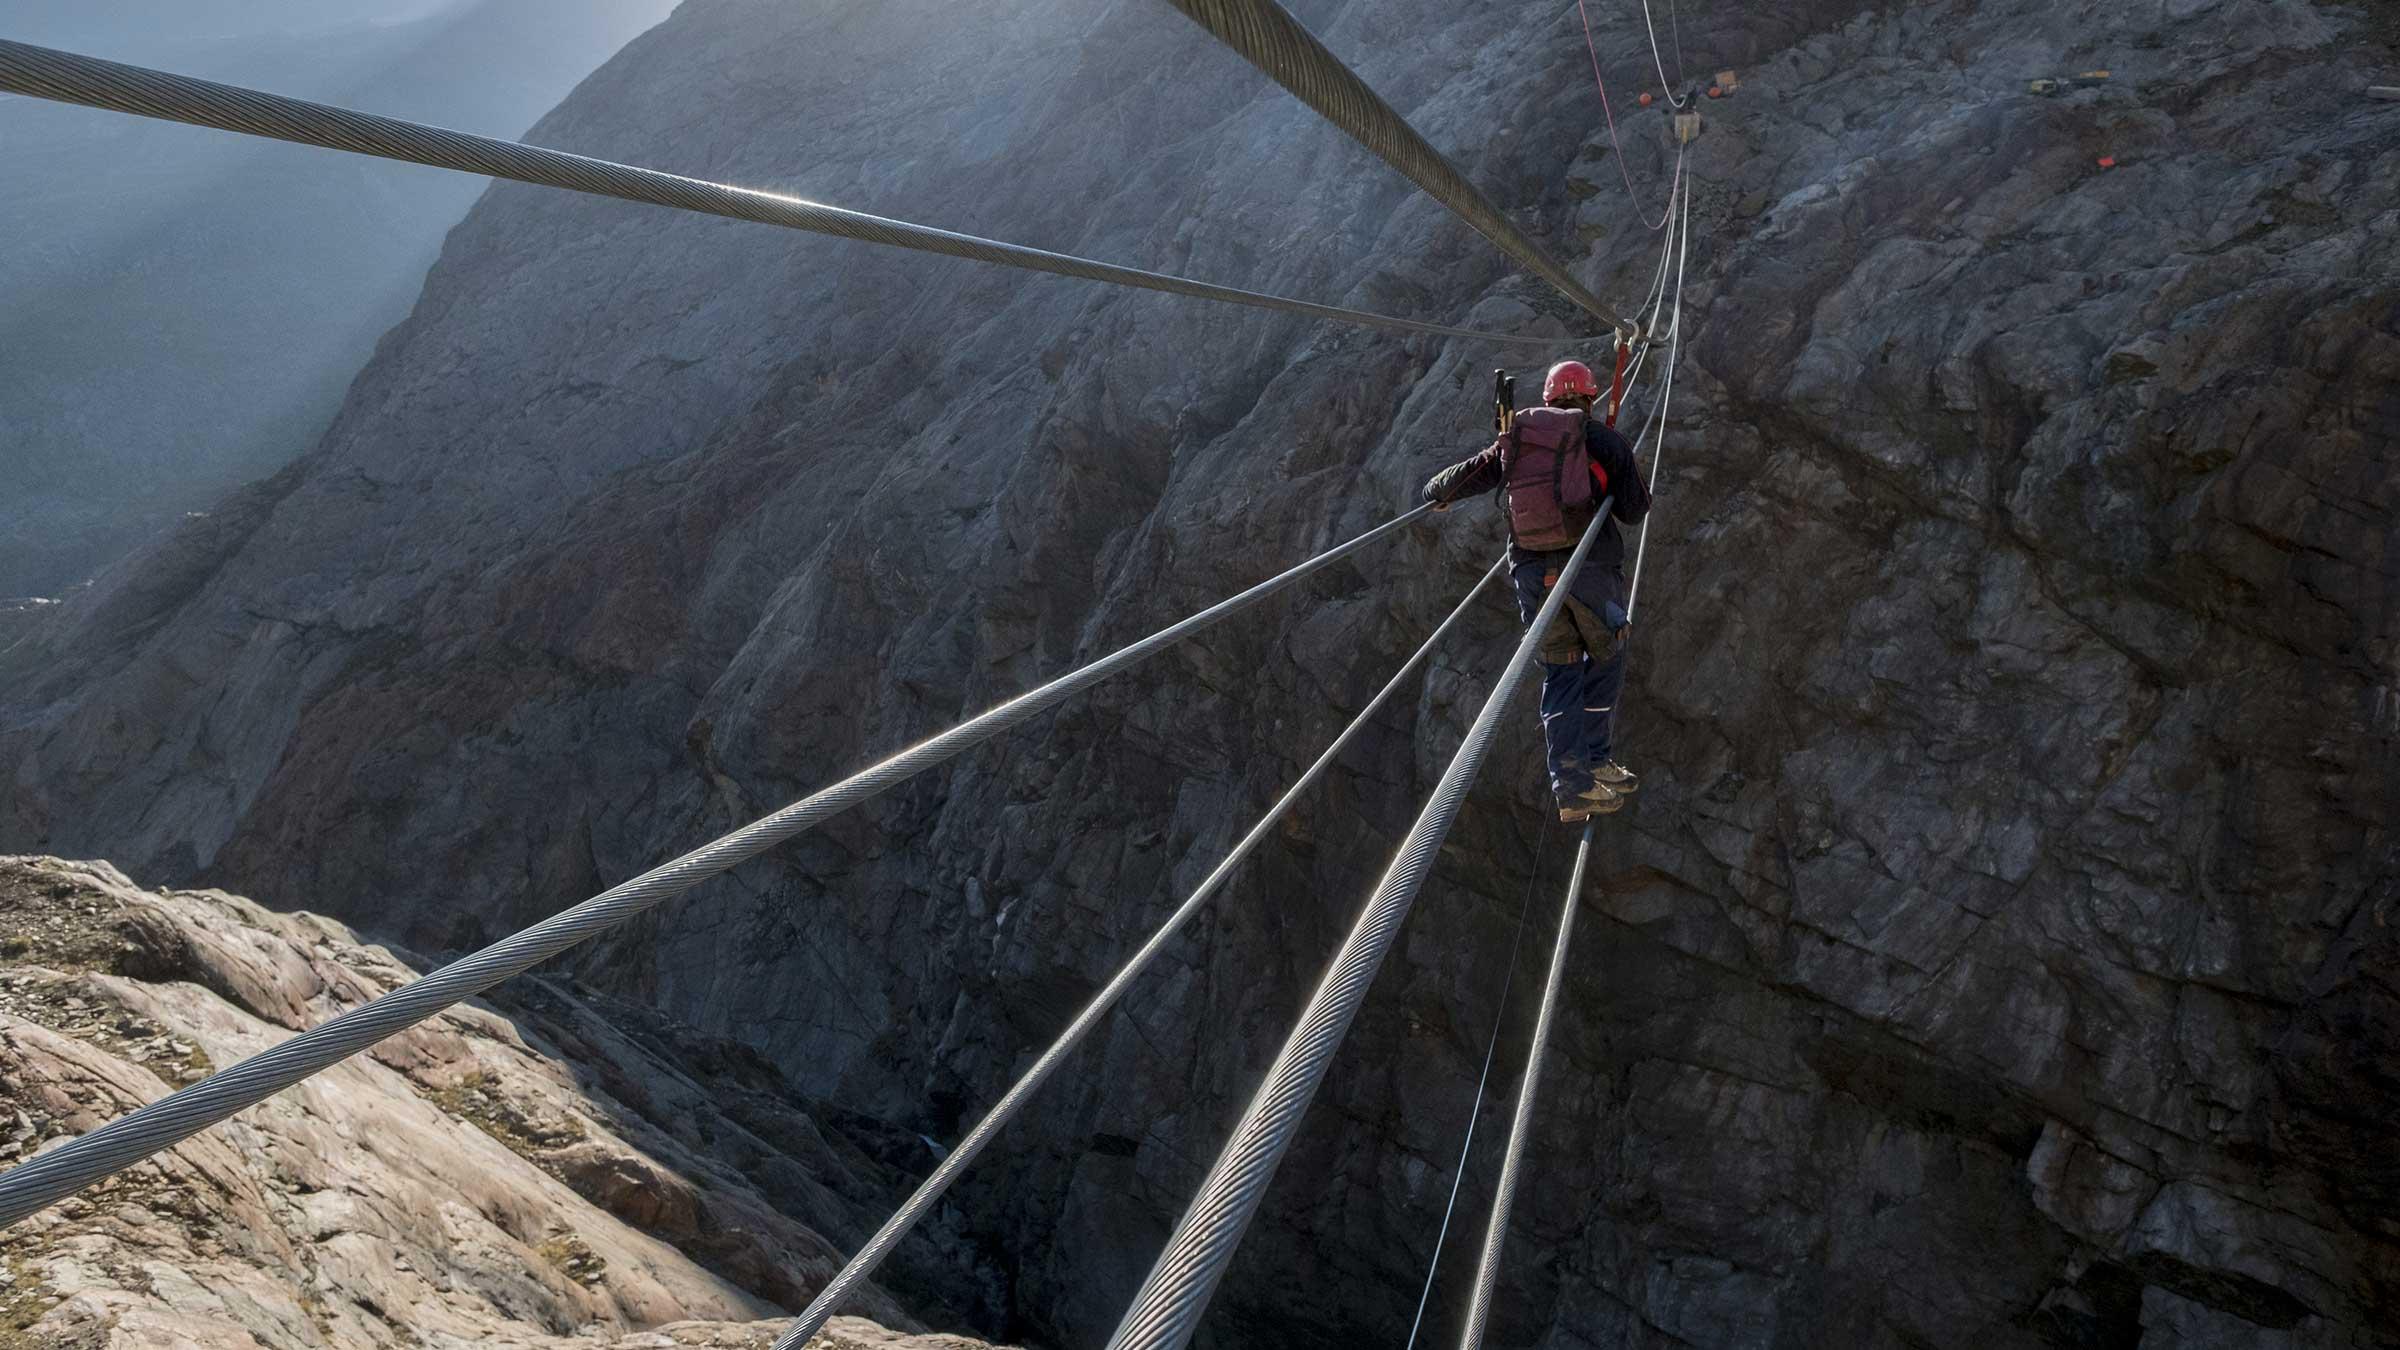 Ein Bauarbeiter balanciert über Stahlseil - Piccard Hängebrücke Obergurgl-Hochgurgl